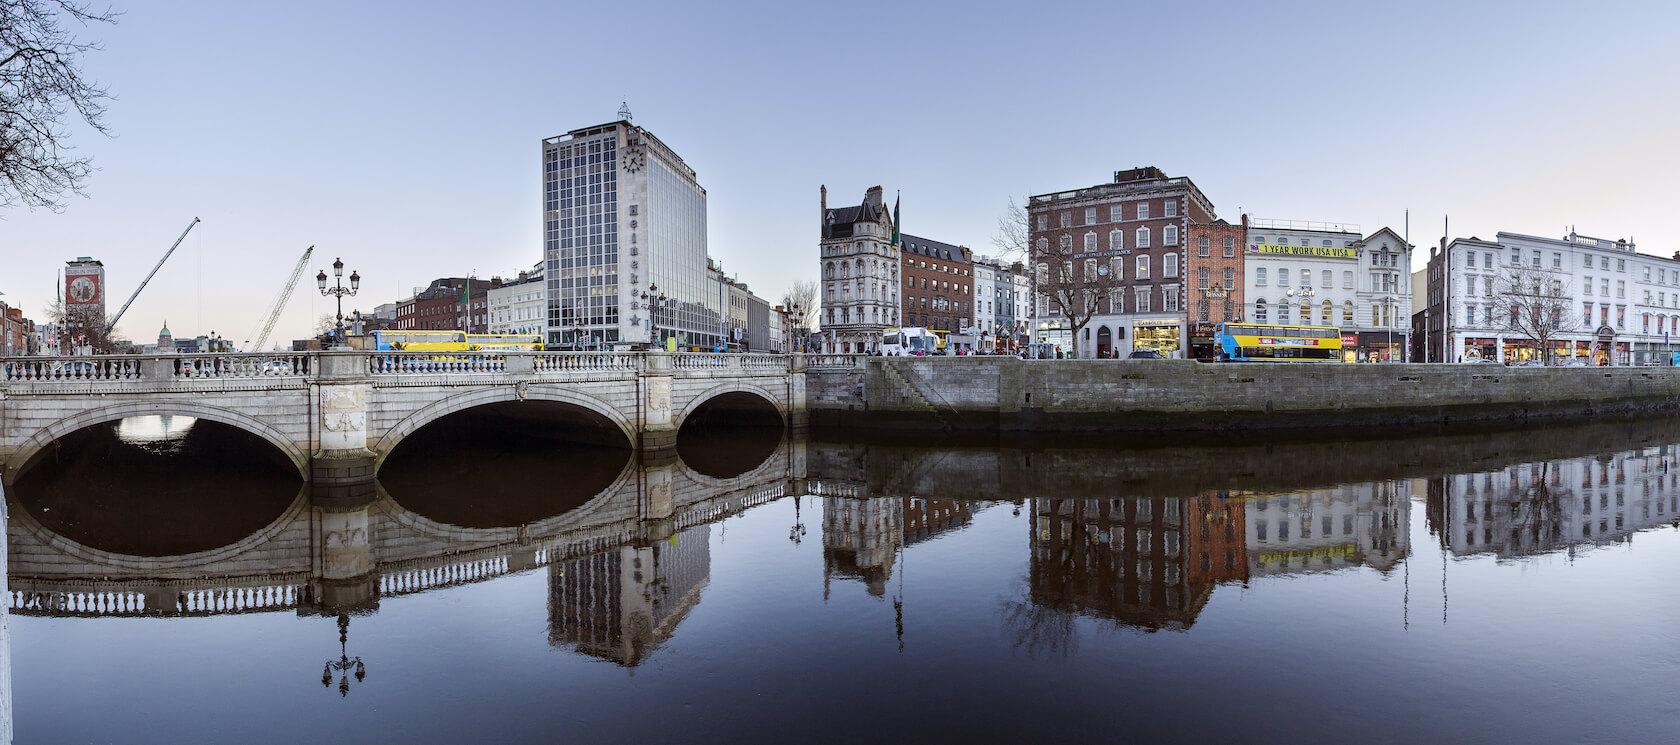 Irish Company Formation - Registration of Companies in Ireland